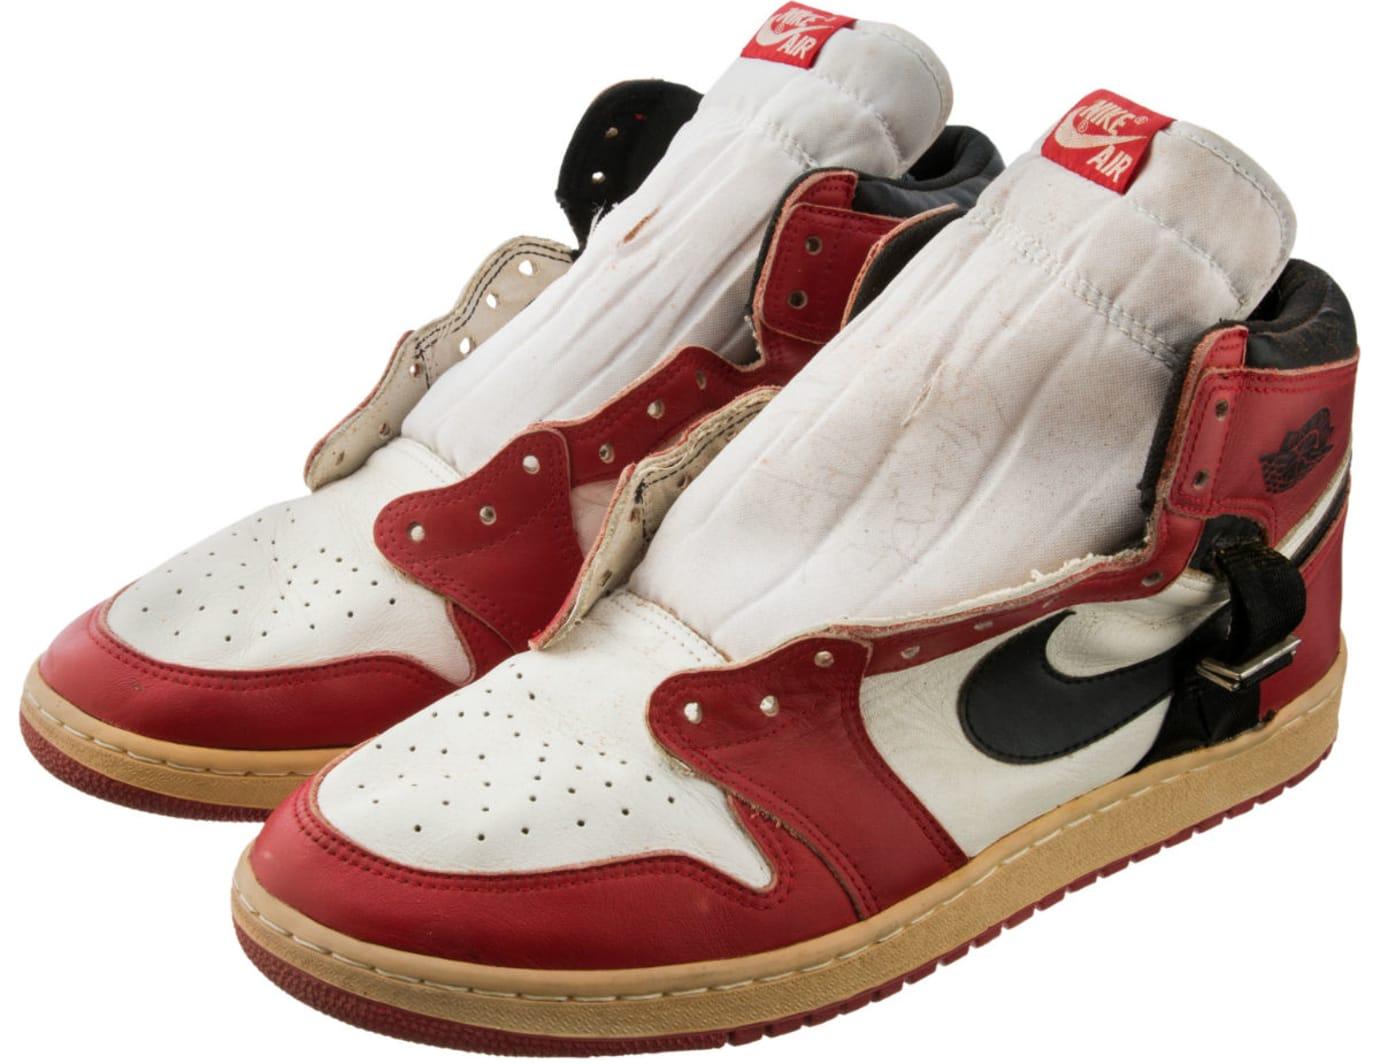 Air Jordan 1 Straps Injury Sample Auction Left